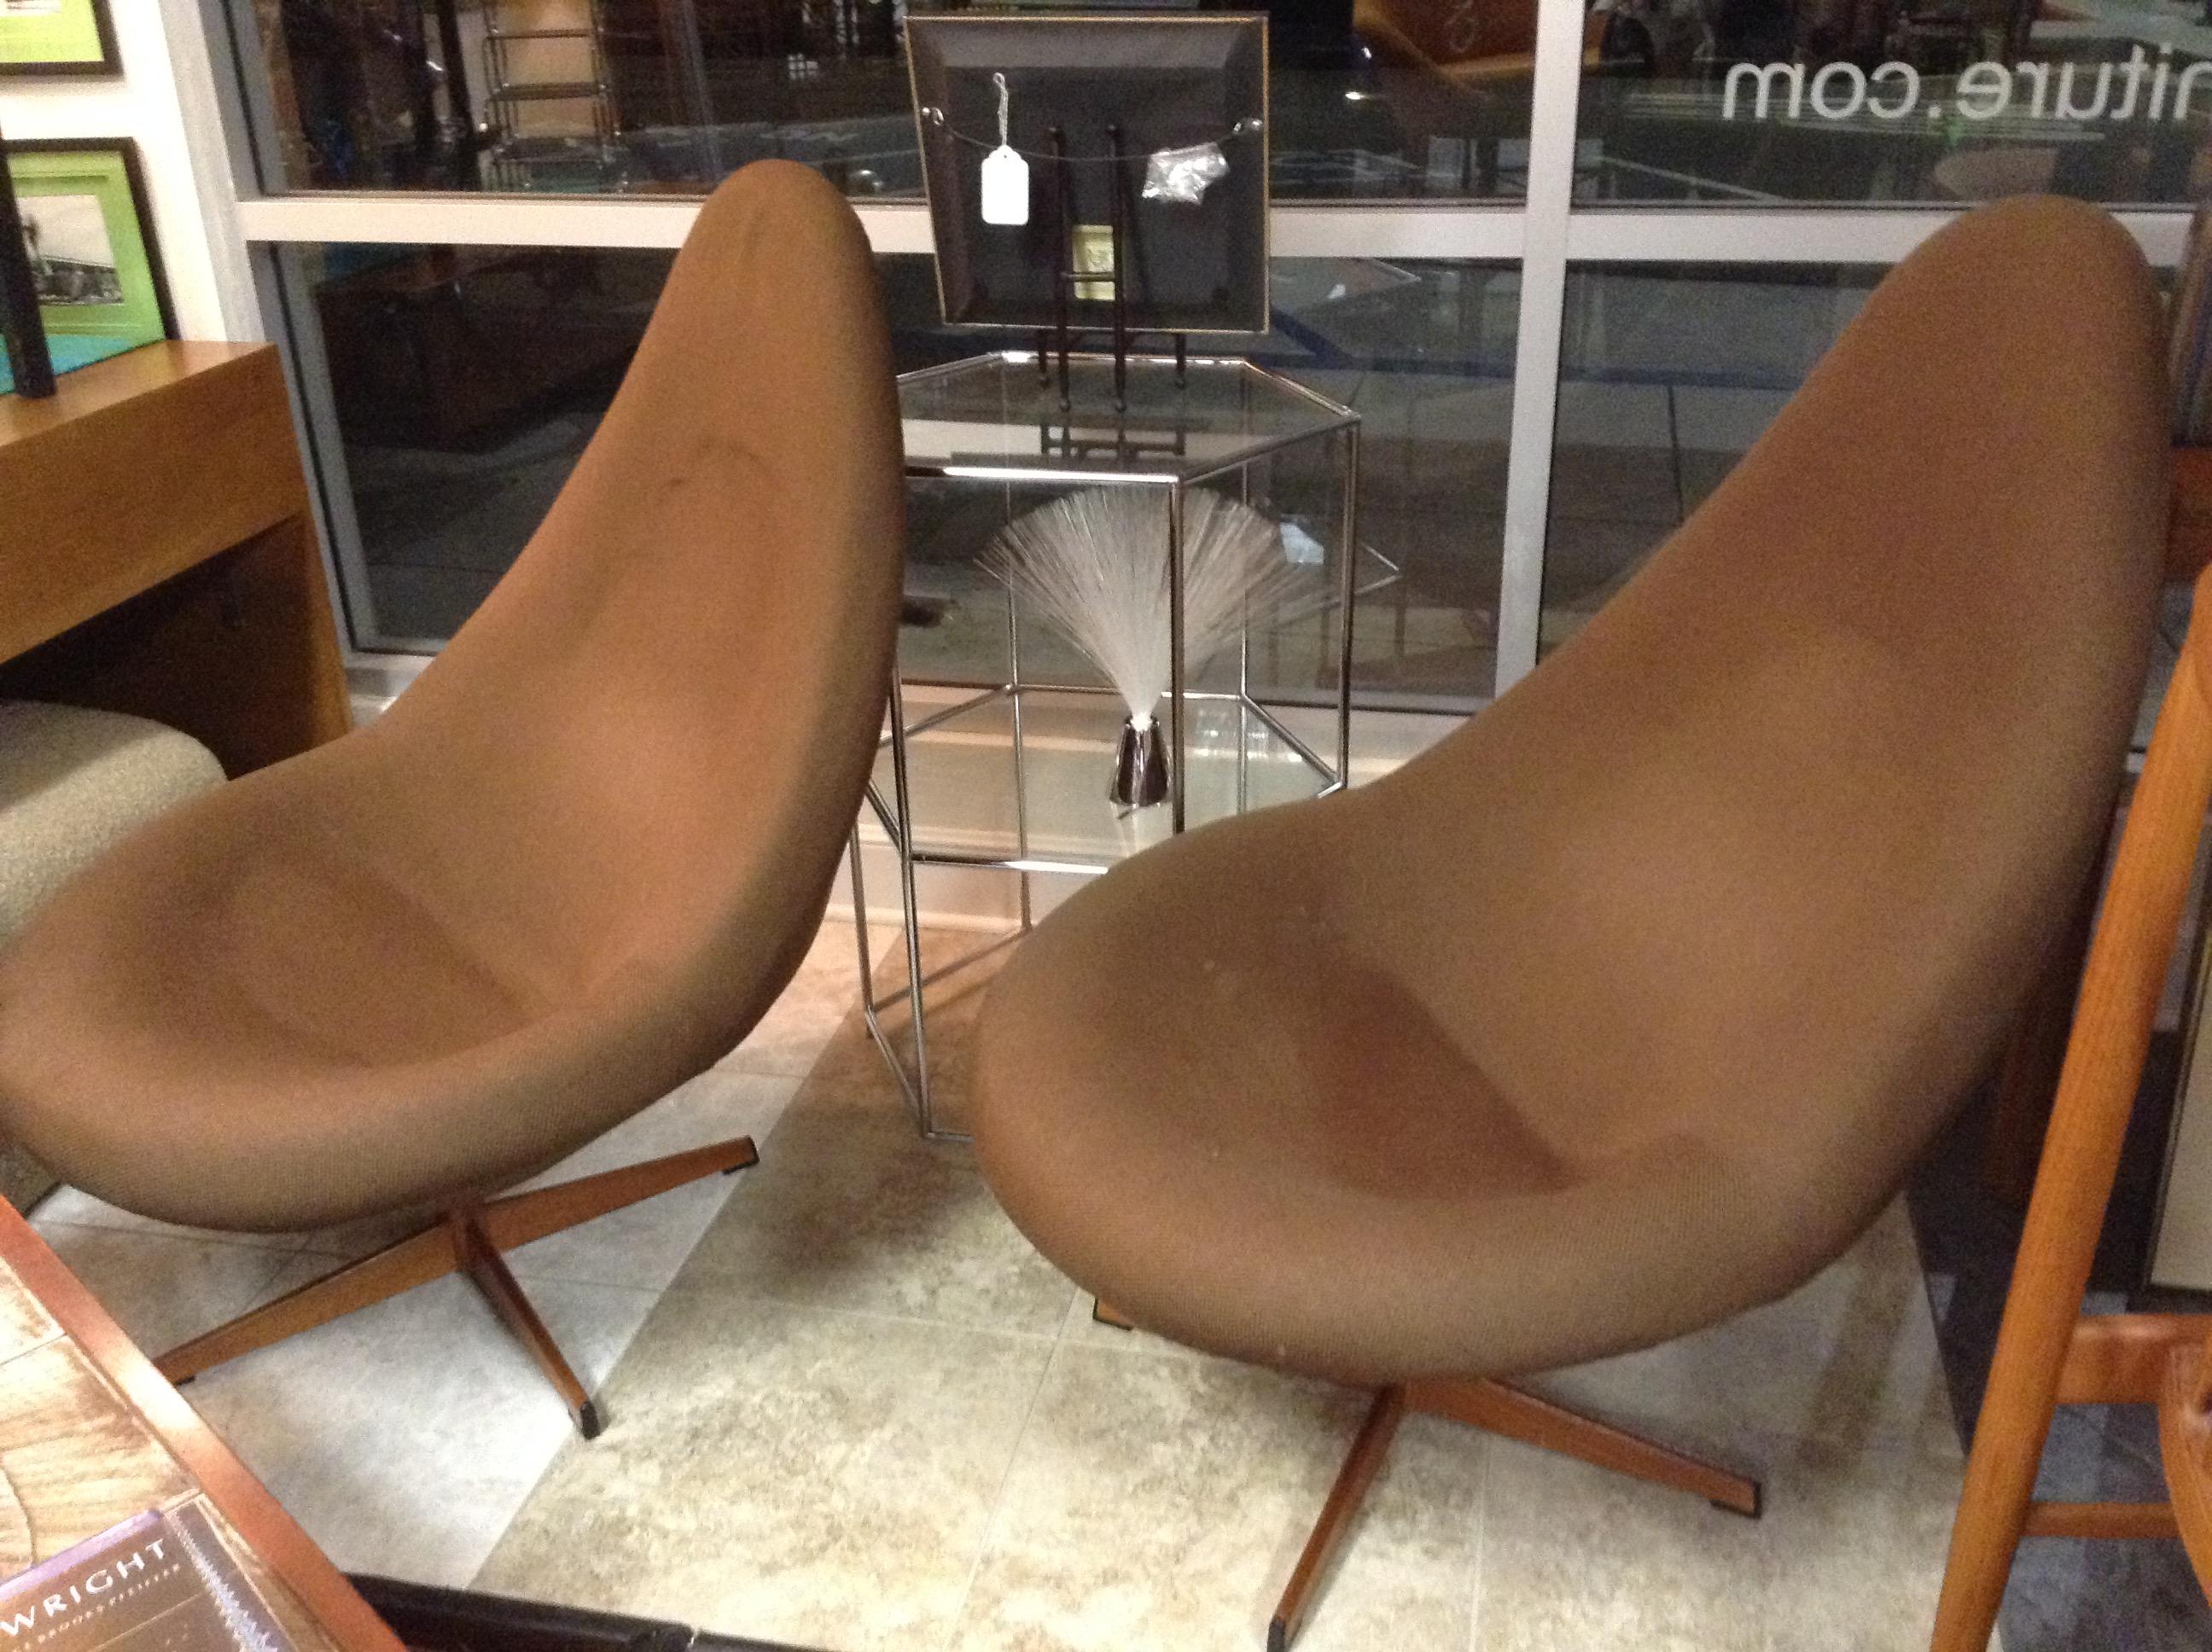 Thrift City Furniture image 9